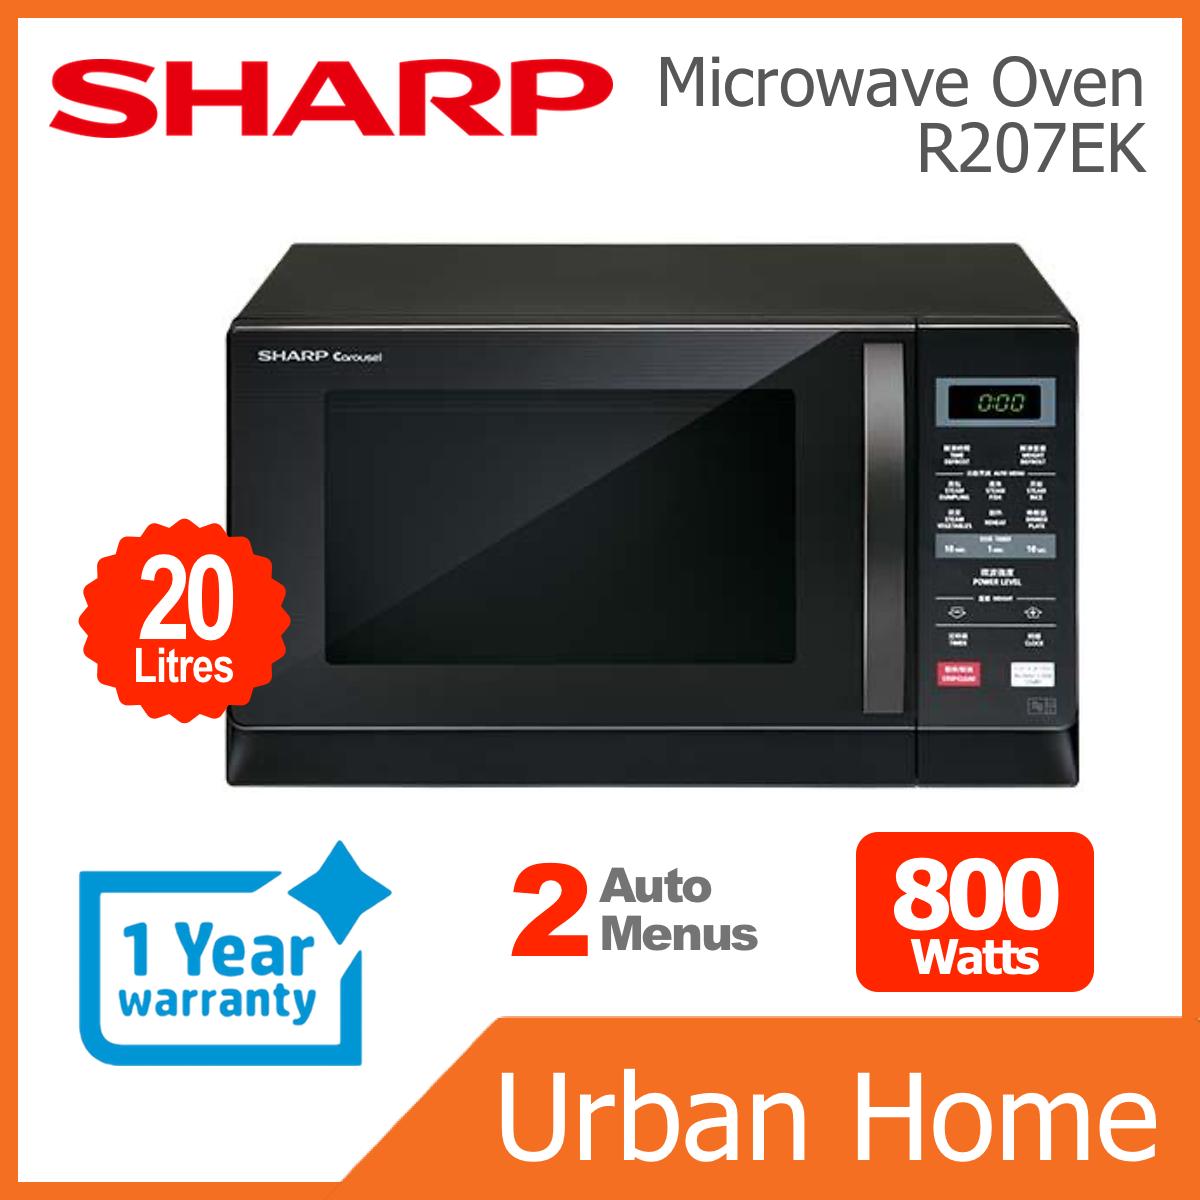 SHARP 20L 800w Digital Microwave Oven (R207EK)